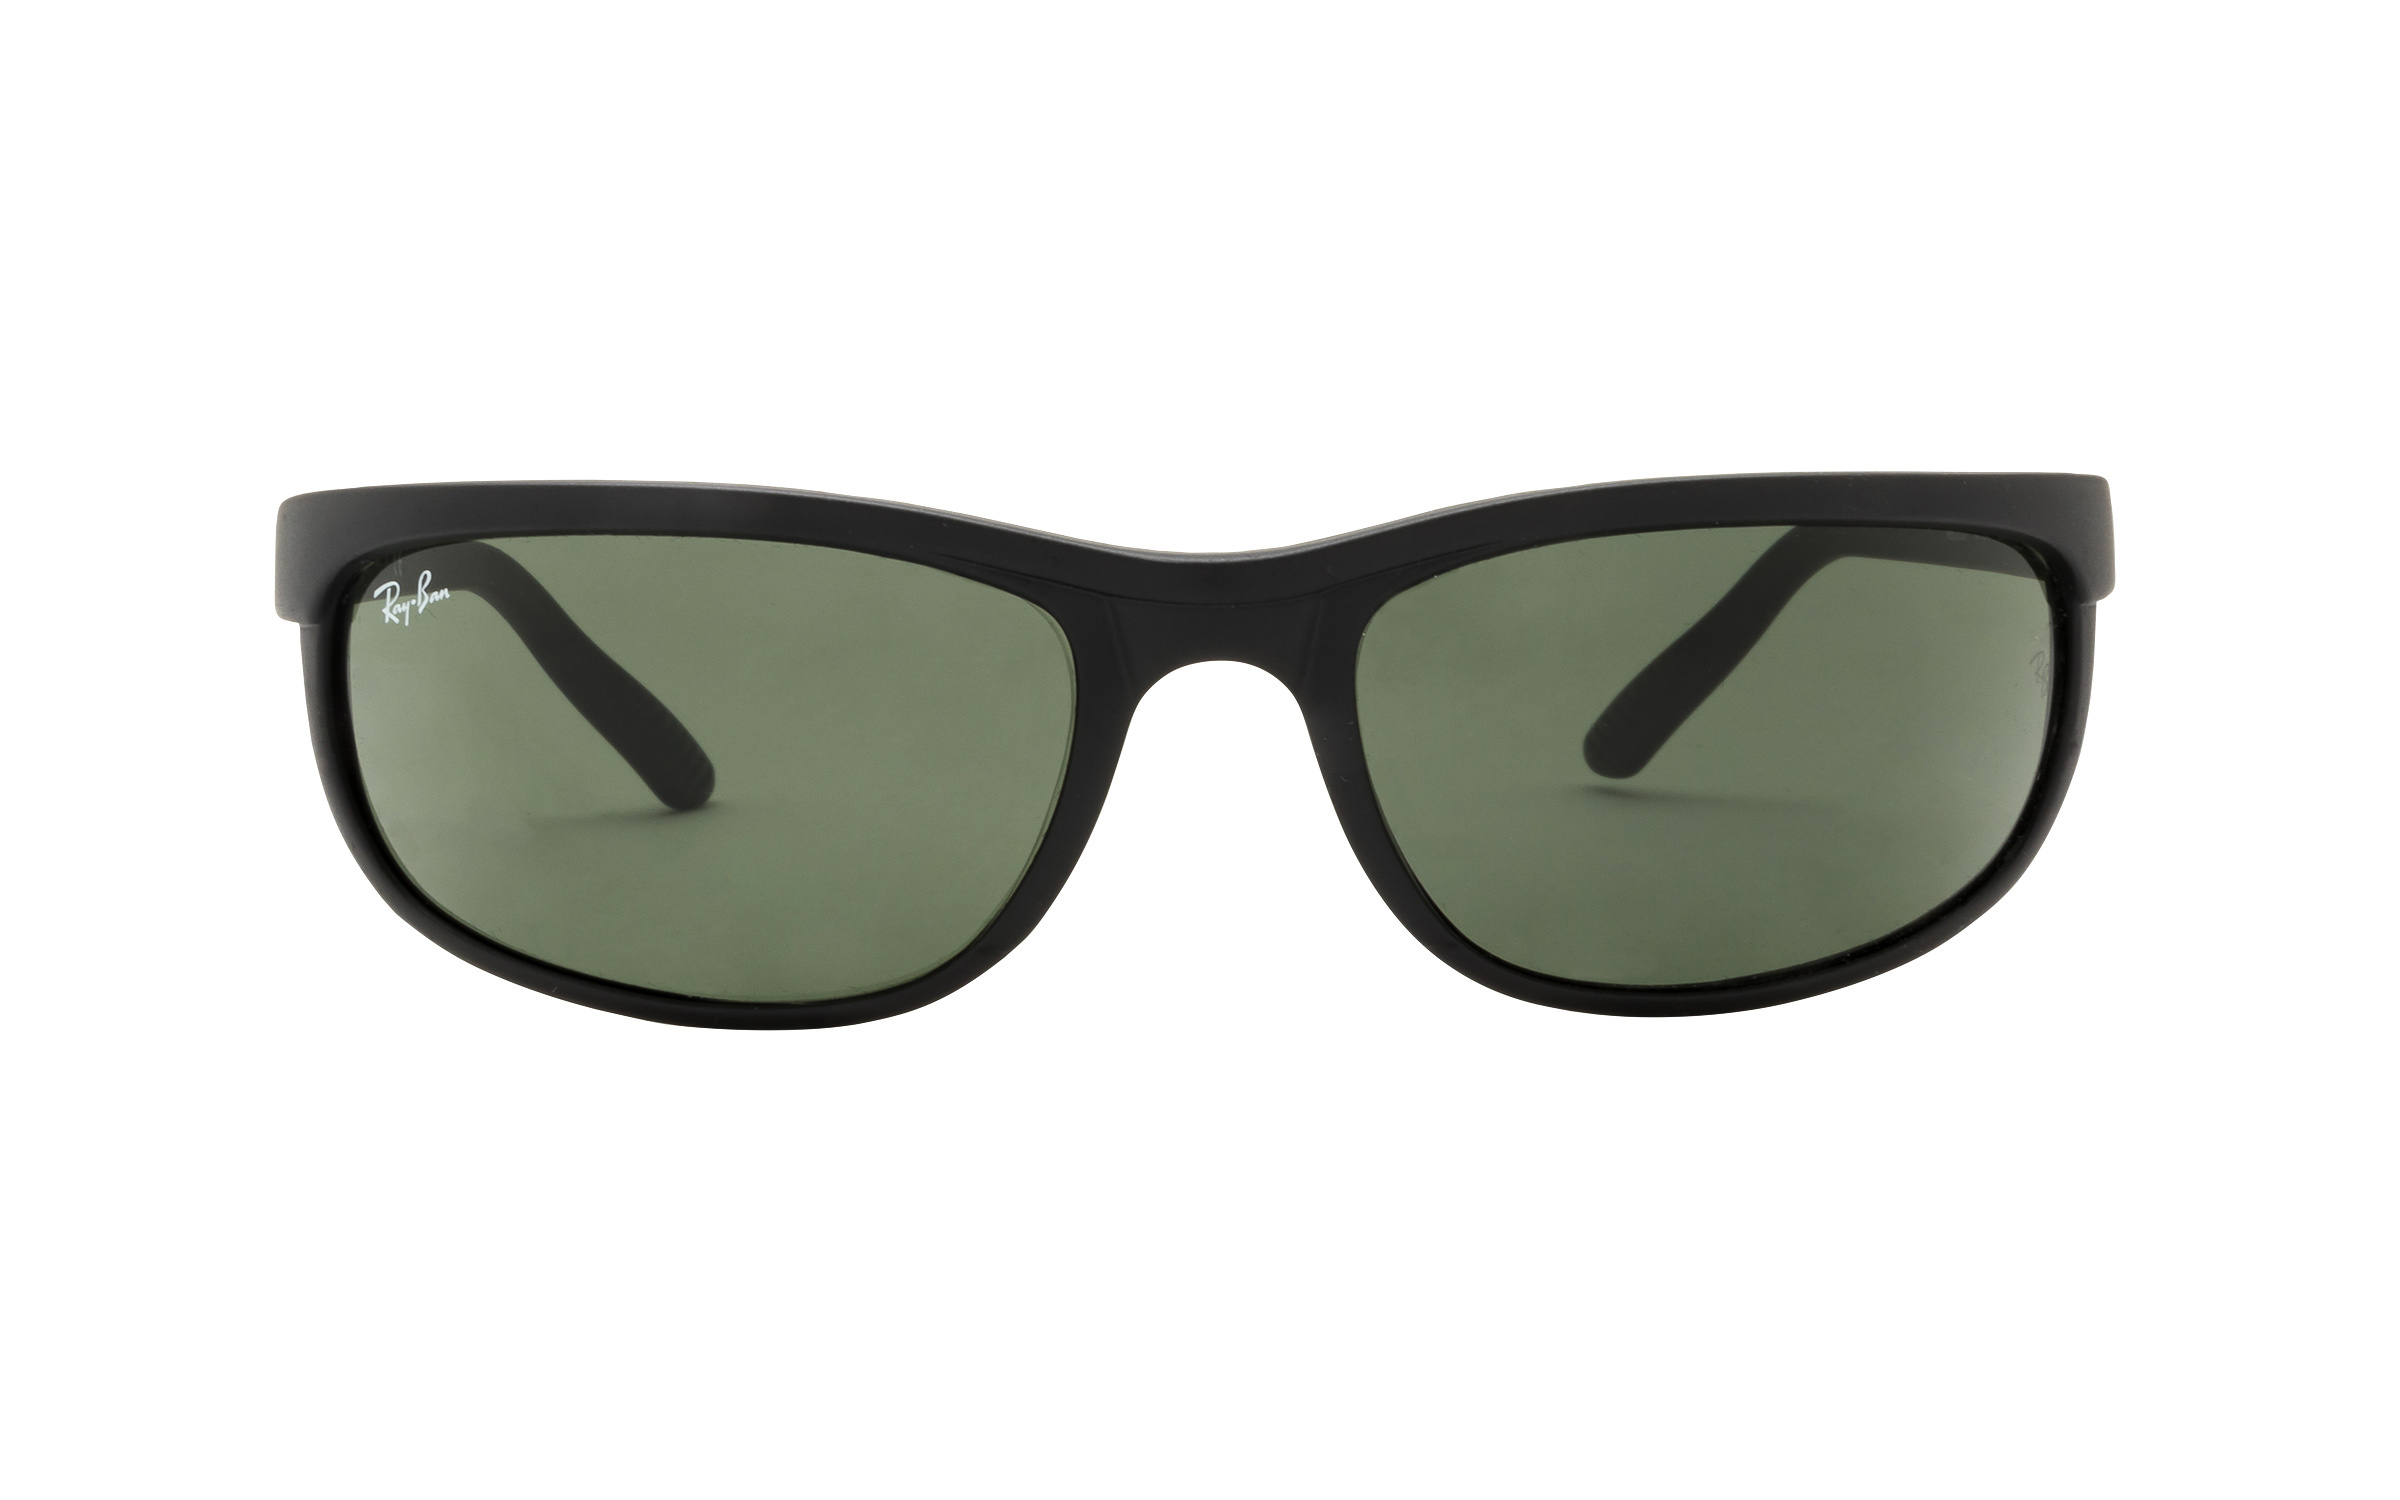 RayBan_Sunglasses_Black_Online_Coastal